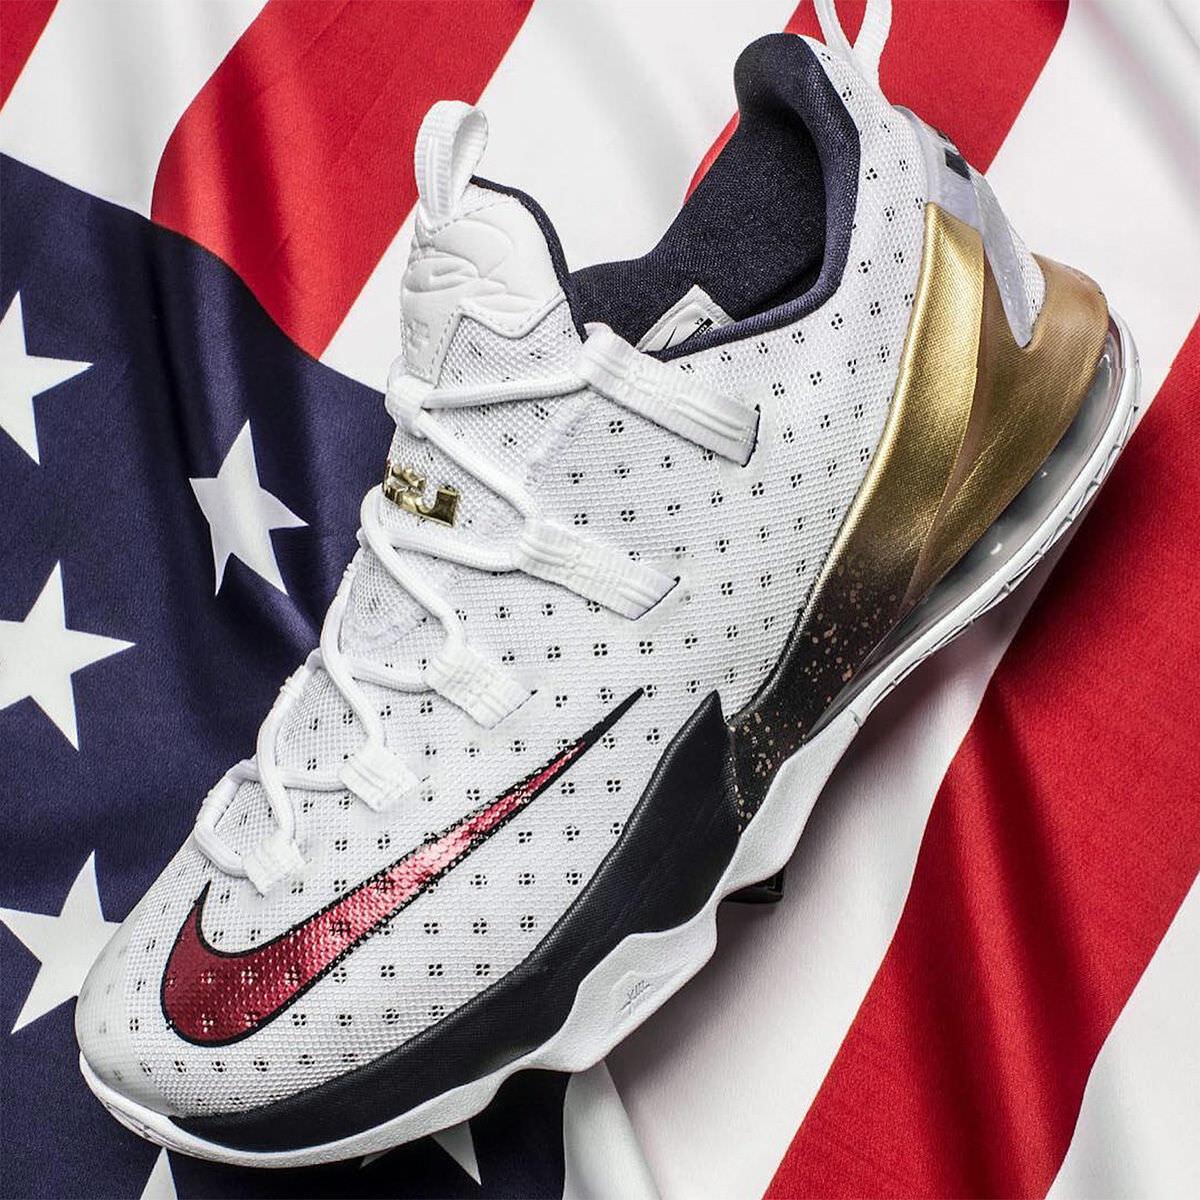 Nike lebron 13 xiii basso usa medaglia d'oro di dimensioni 831925-164 cavs mvp